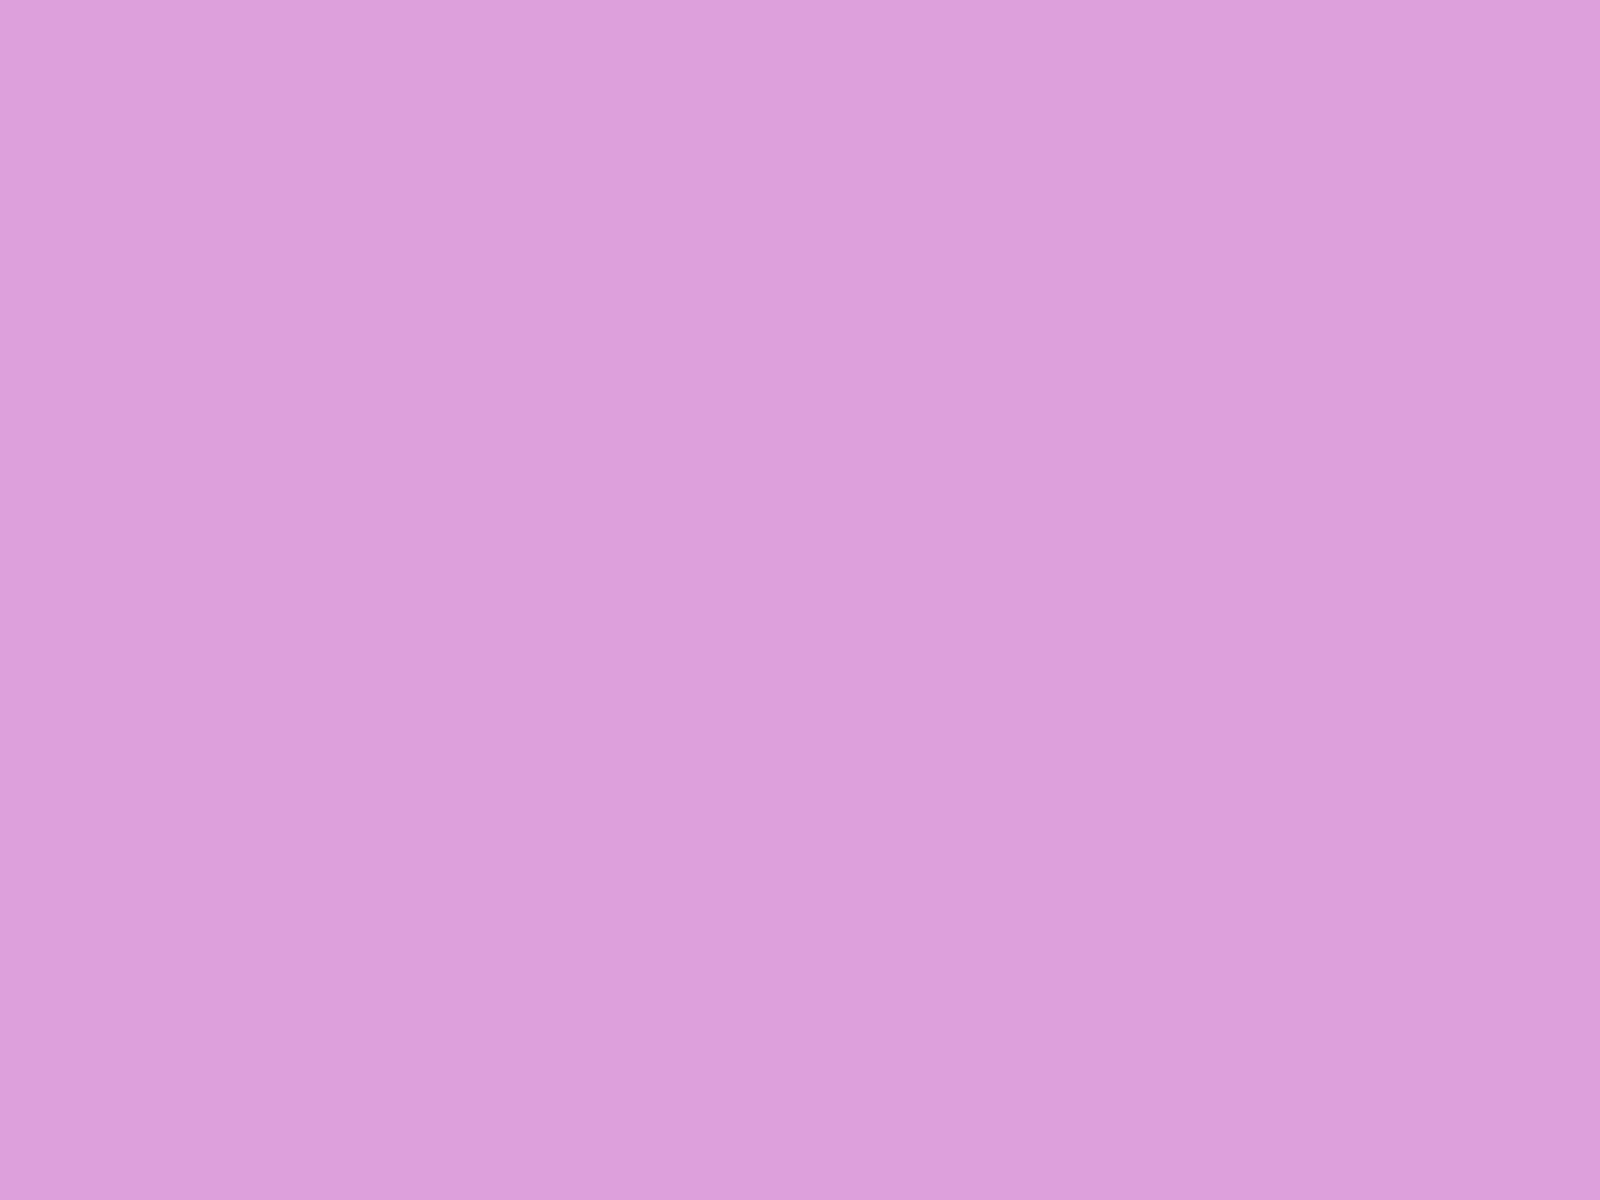 1600x1200 Medium Lavender Magenta Solid Color Background